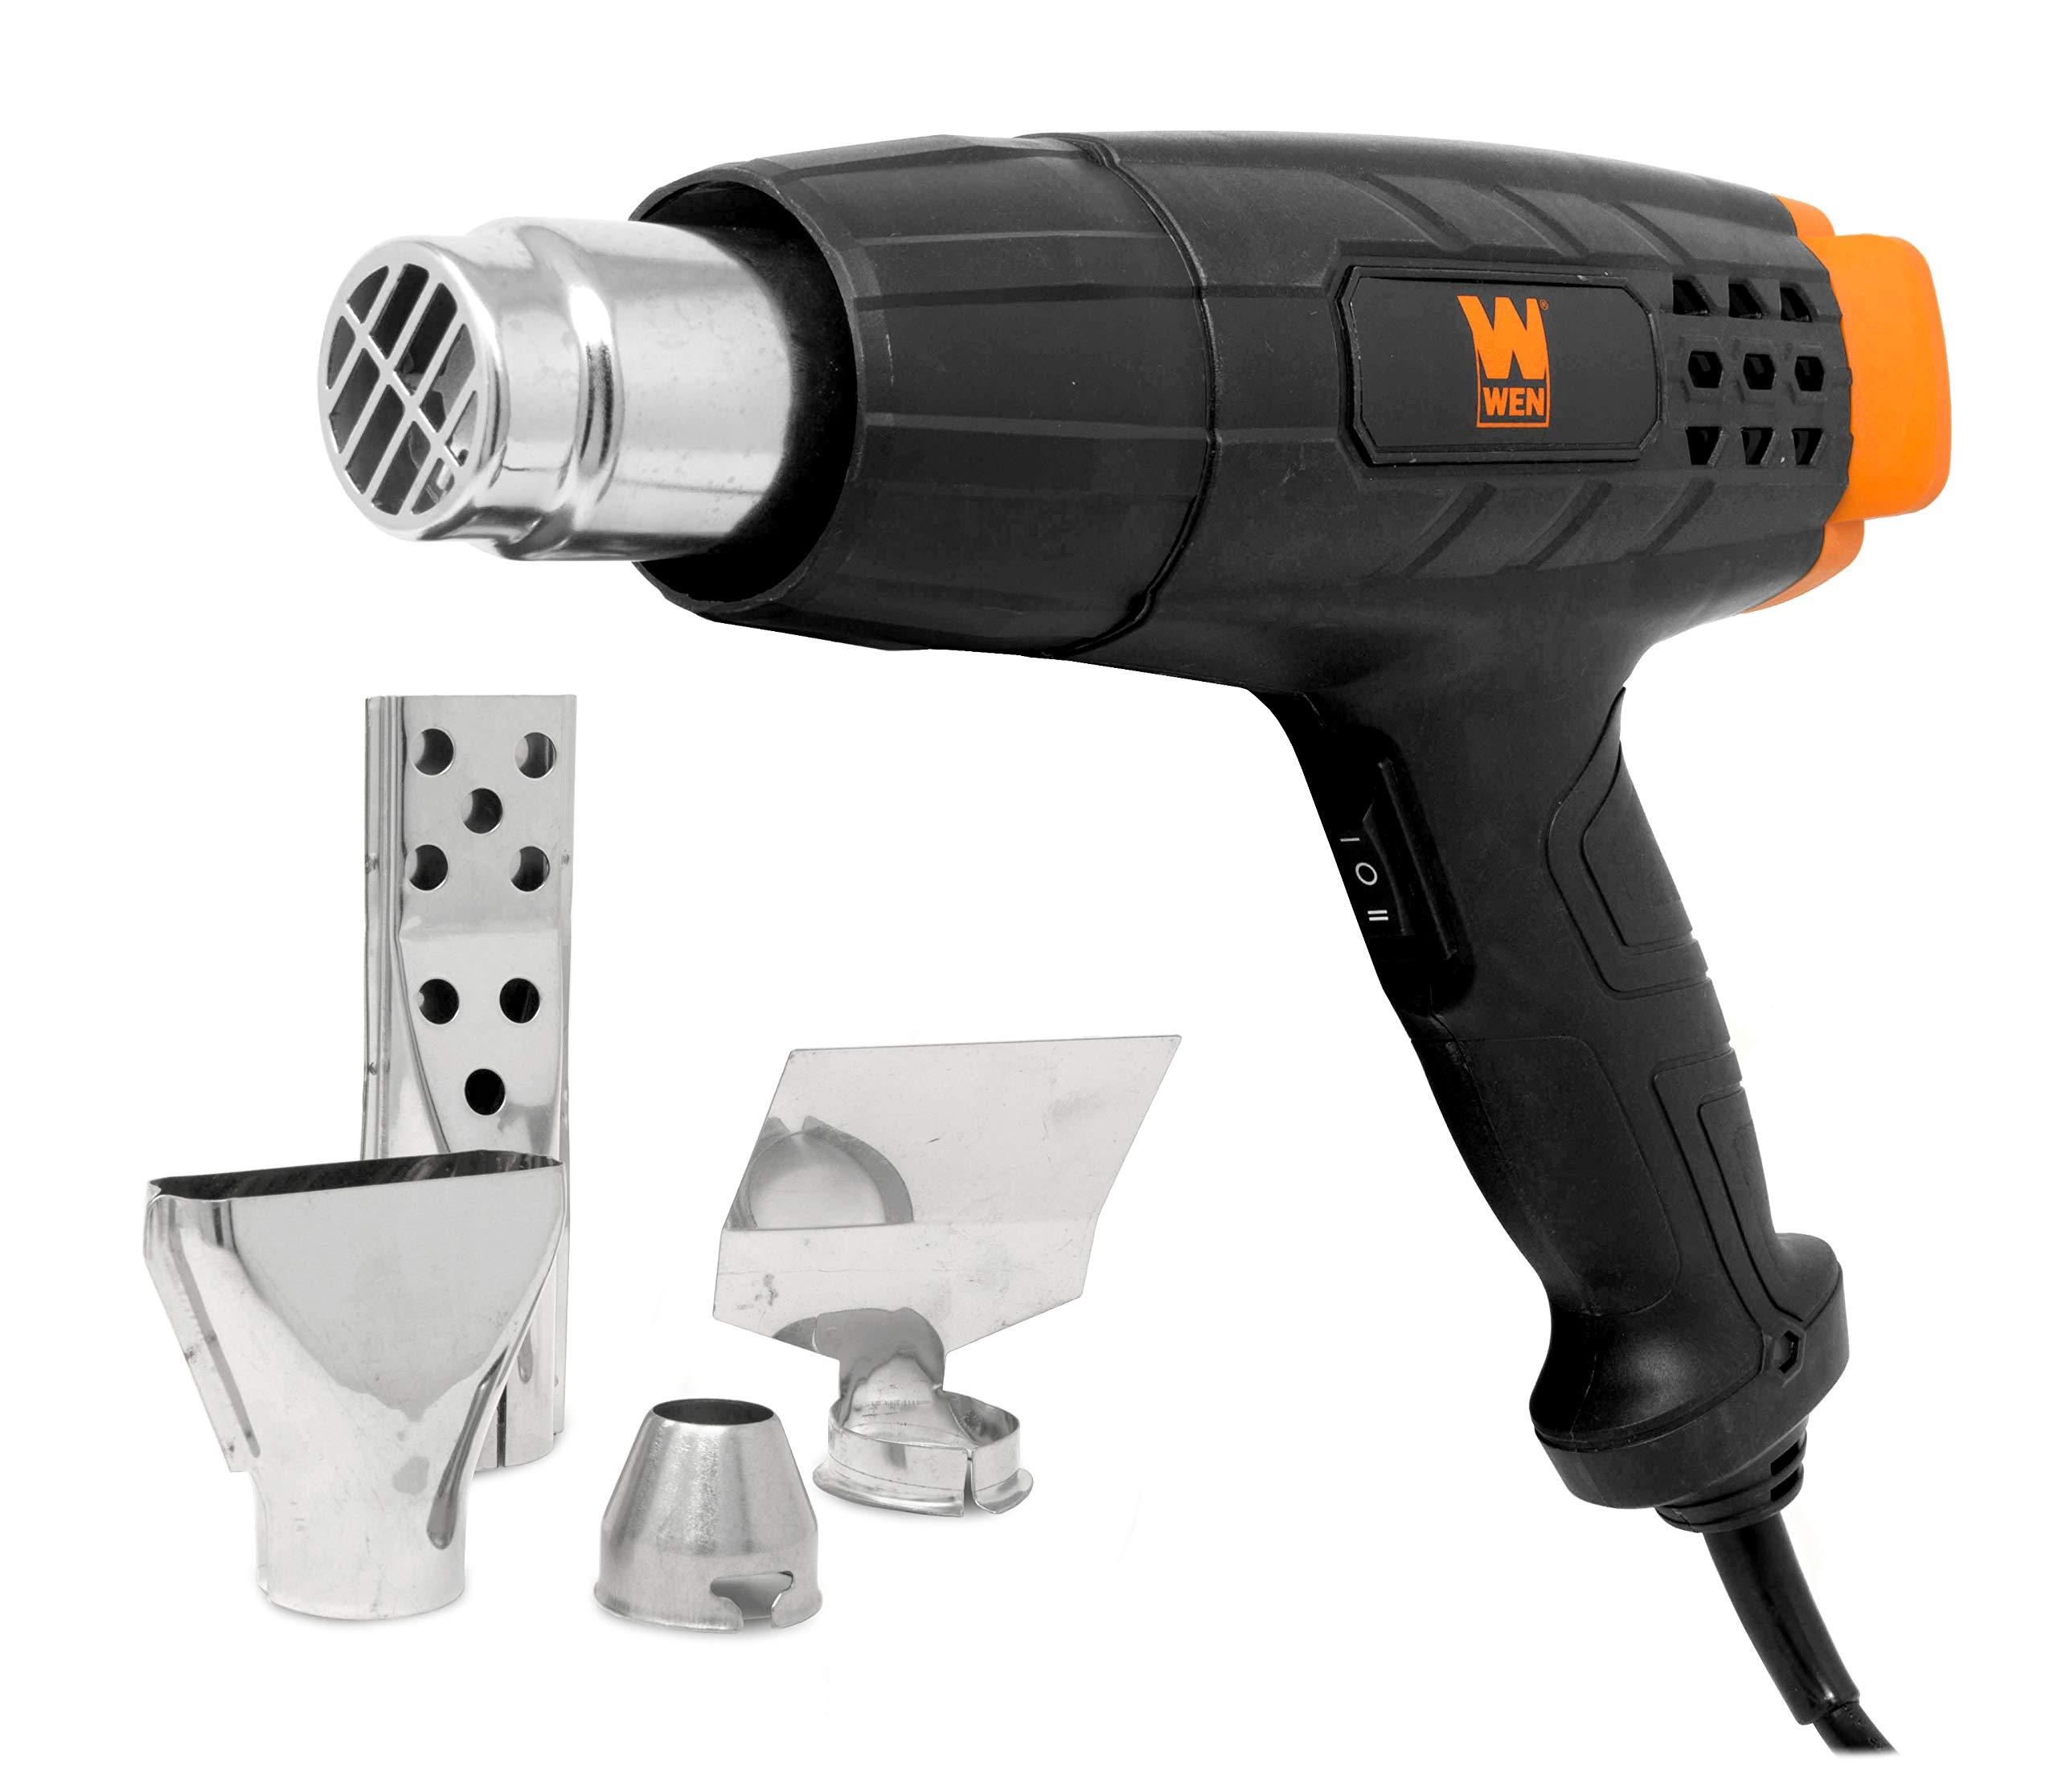 WEN HG1022 12.5-Amp Dual-Temperature Heat Gun with Attachments